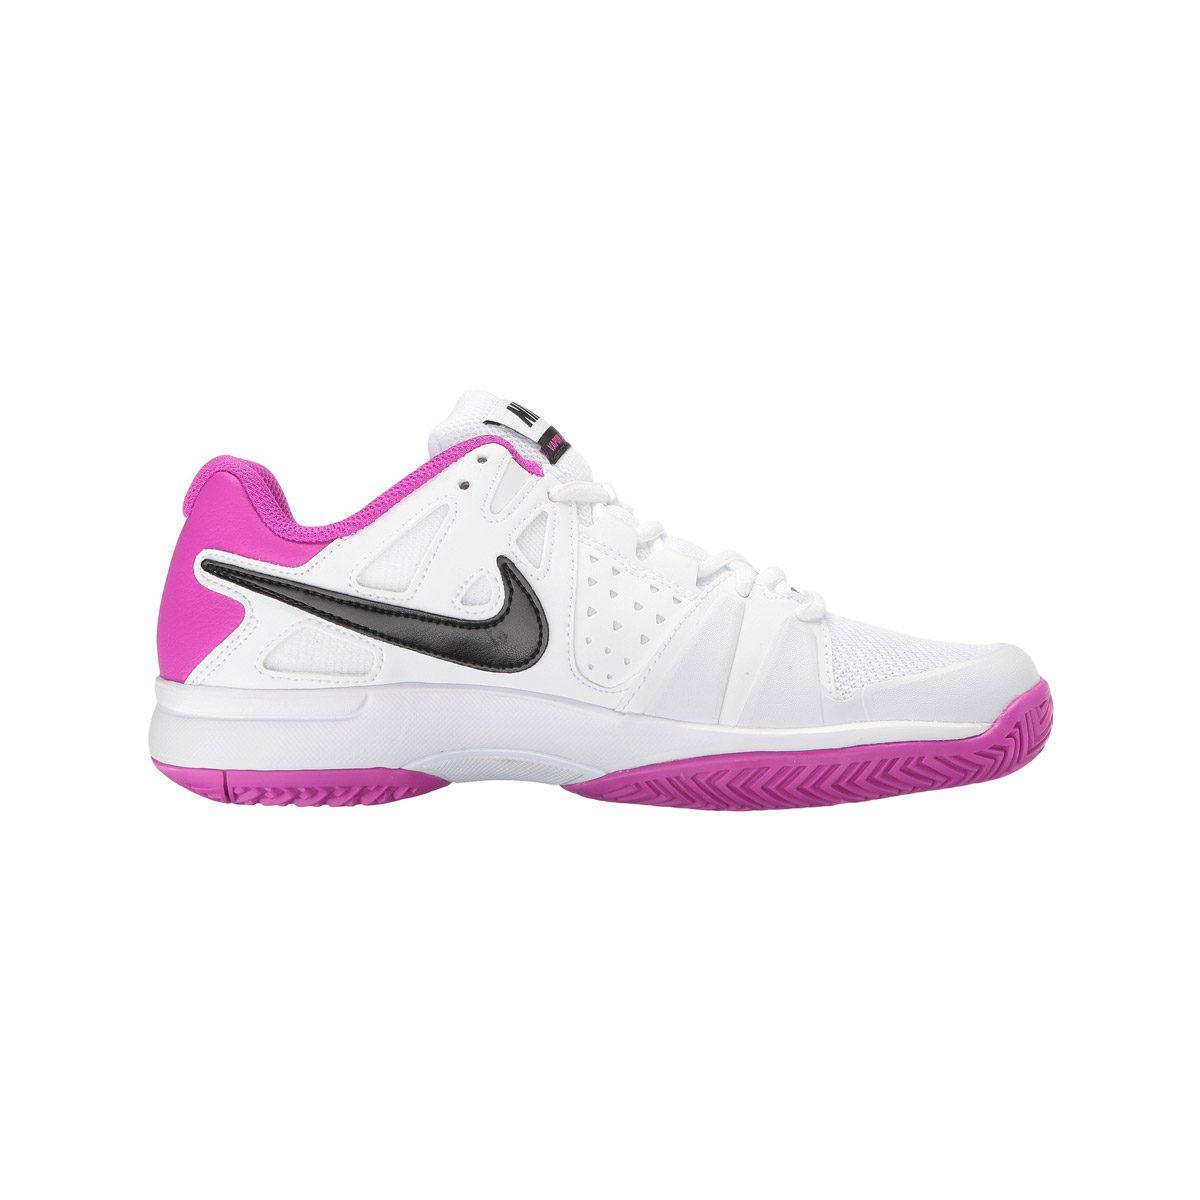 5bed5d3c2ed Nike Air Vapor Advantage Women s Shoes - White Pink - Peake ...